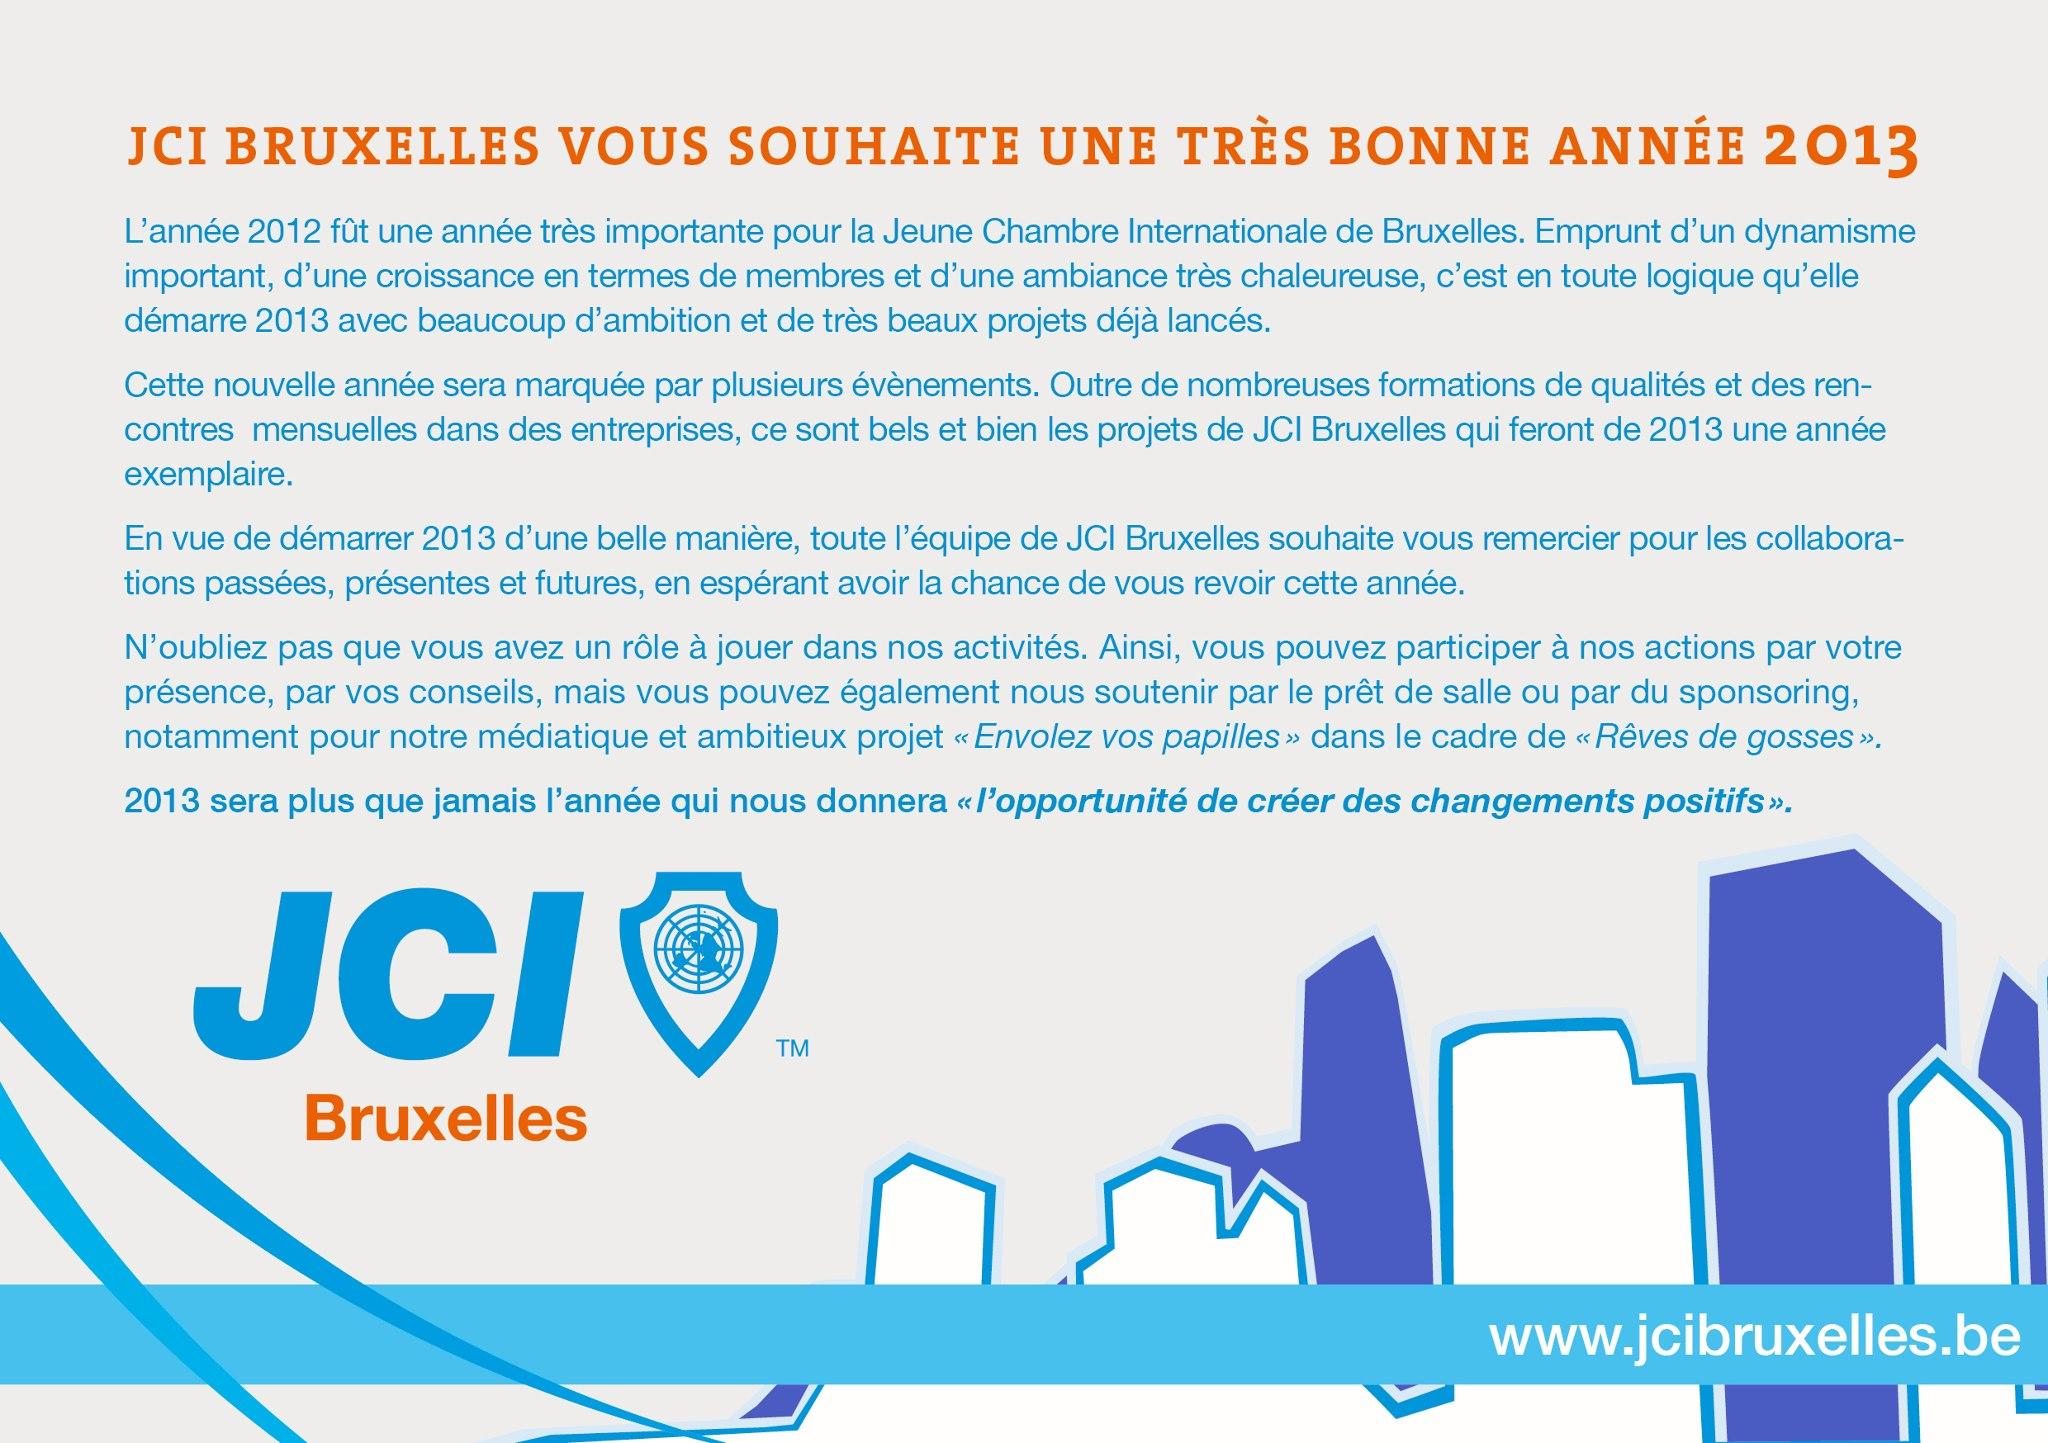 www.jcibruxelles.be